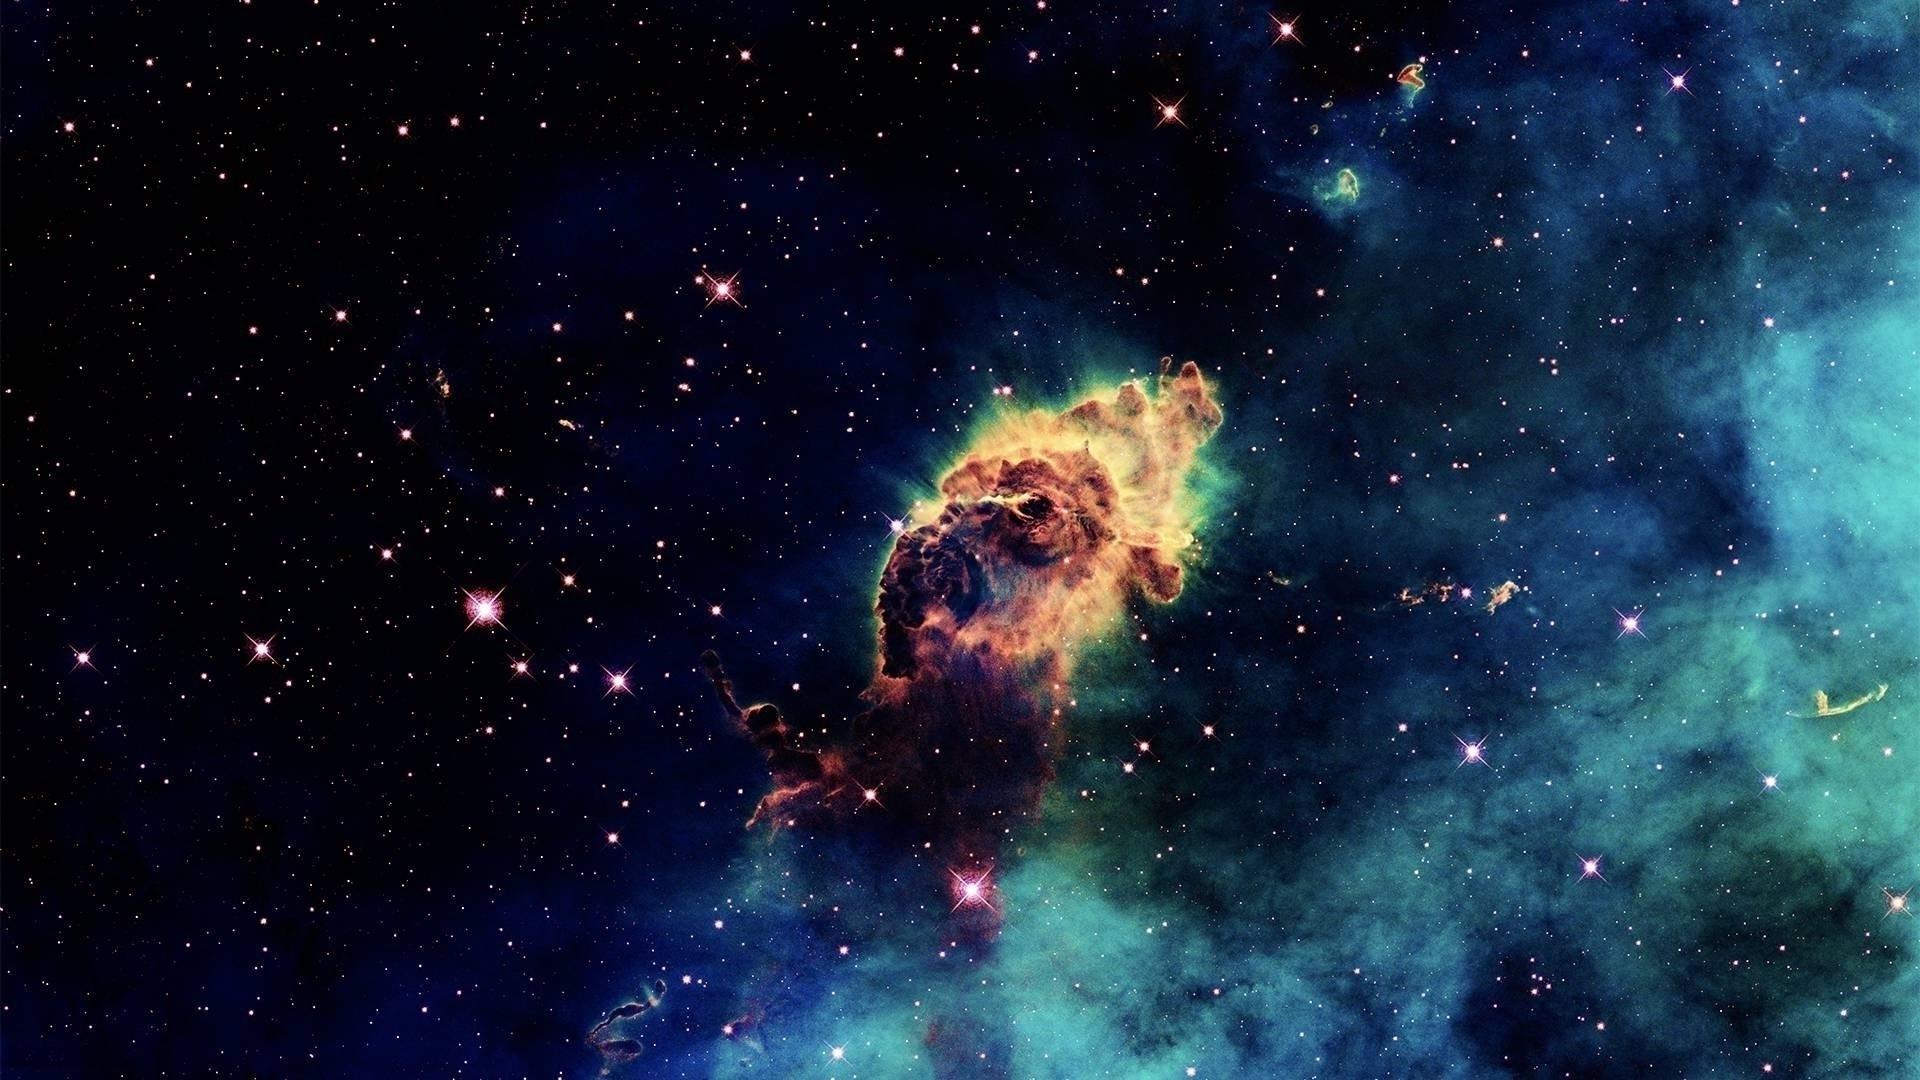 Outer space universe nebula stars wallpaper | 1920x1080 ... Hd Wallpaper 1920x1080 Download